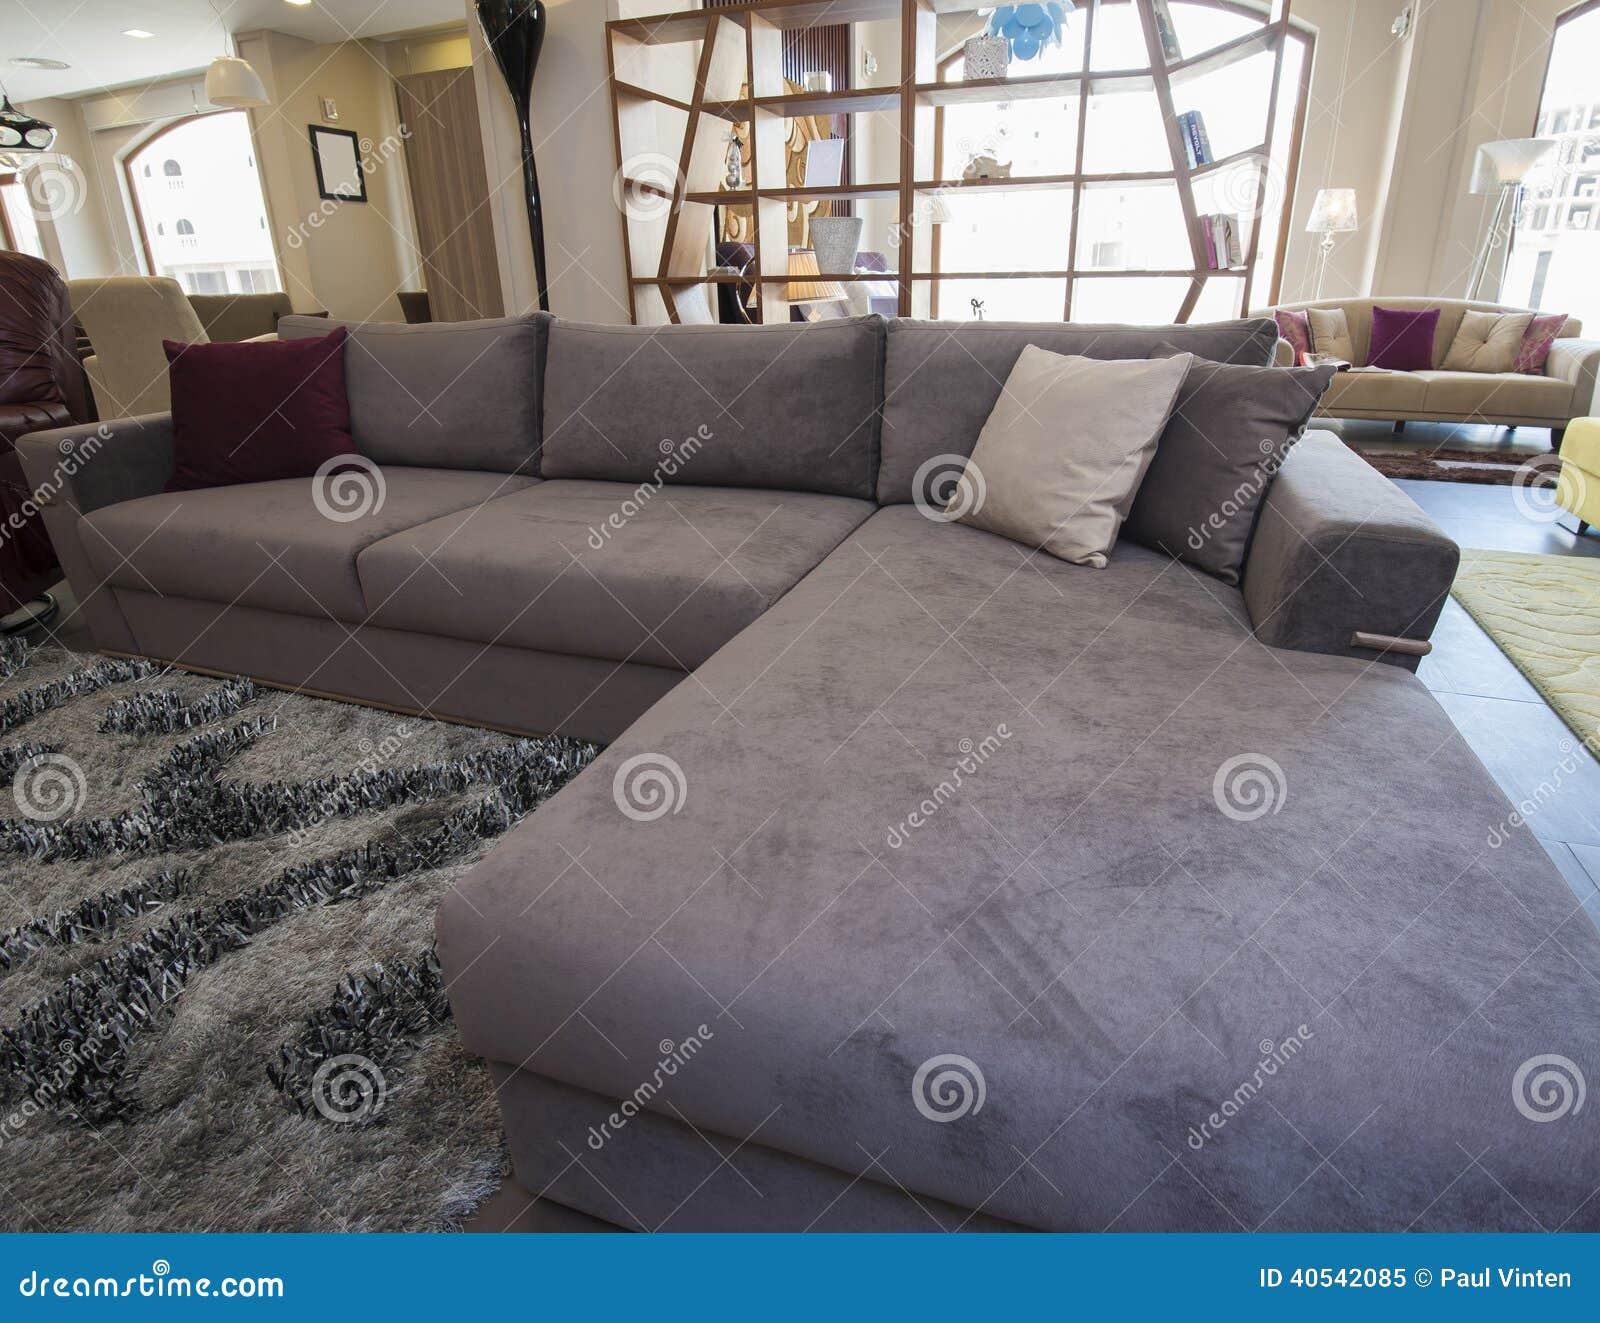 Sofa De Canto Confortavel Veja Ideias Para Deixar A Sala Perfeita O  -> Estofados De Canto Confortavel Para Sala Pequena